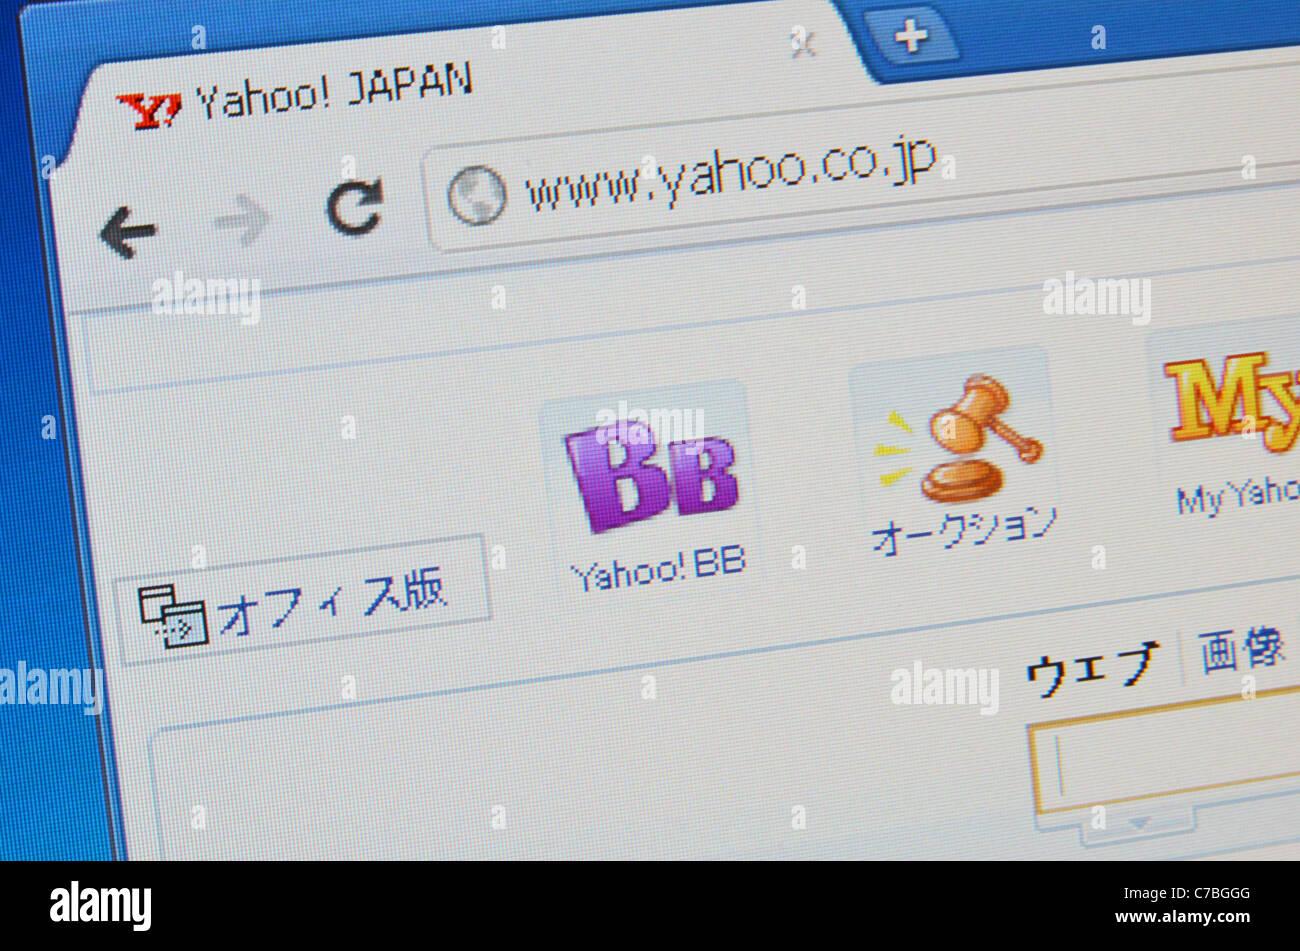 Yahoo! Japan screenshot - Stock Image